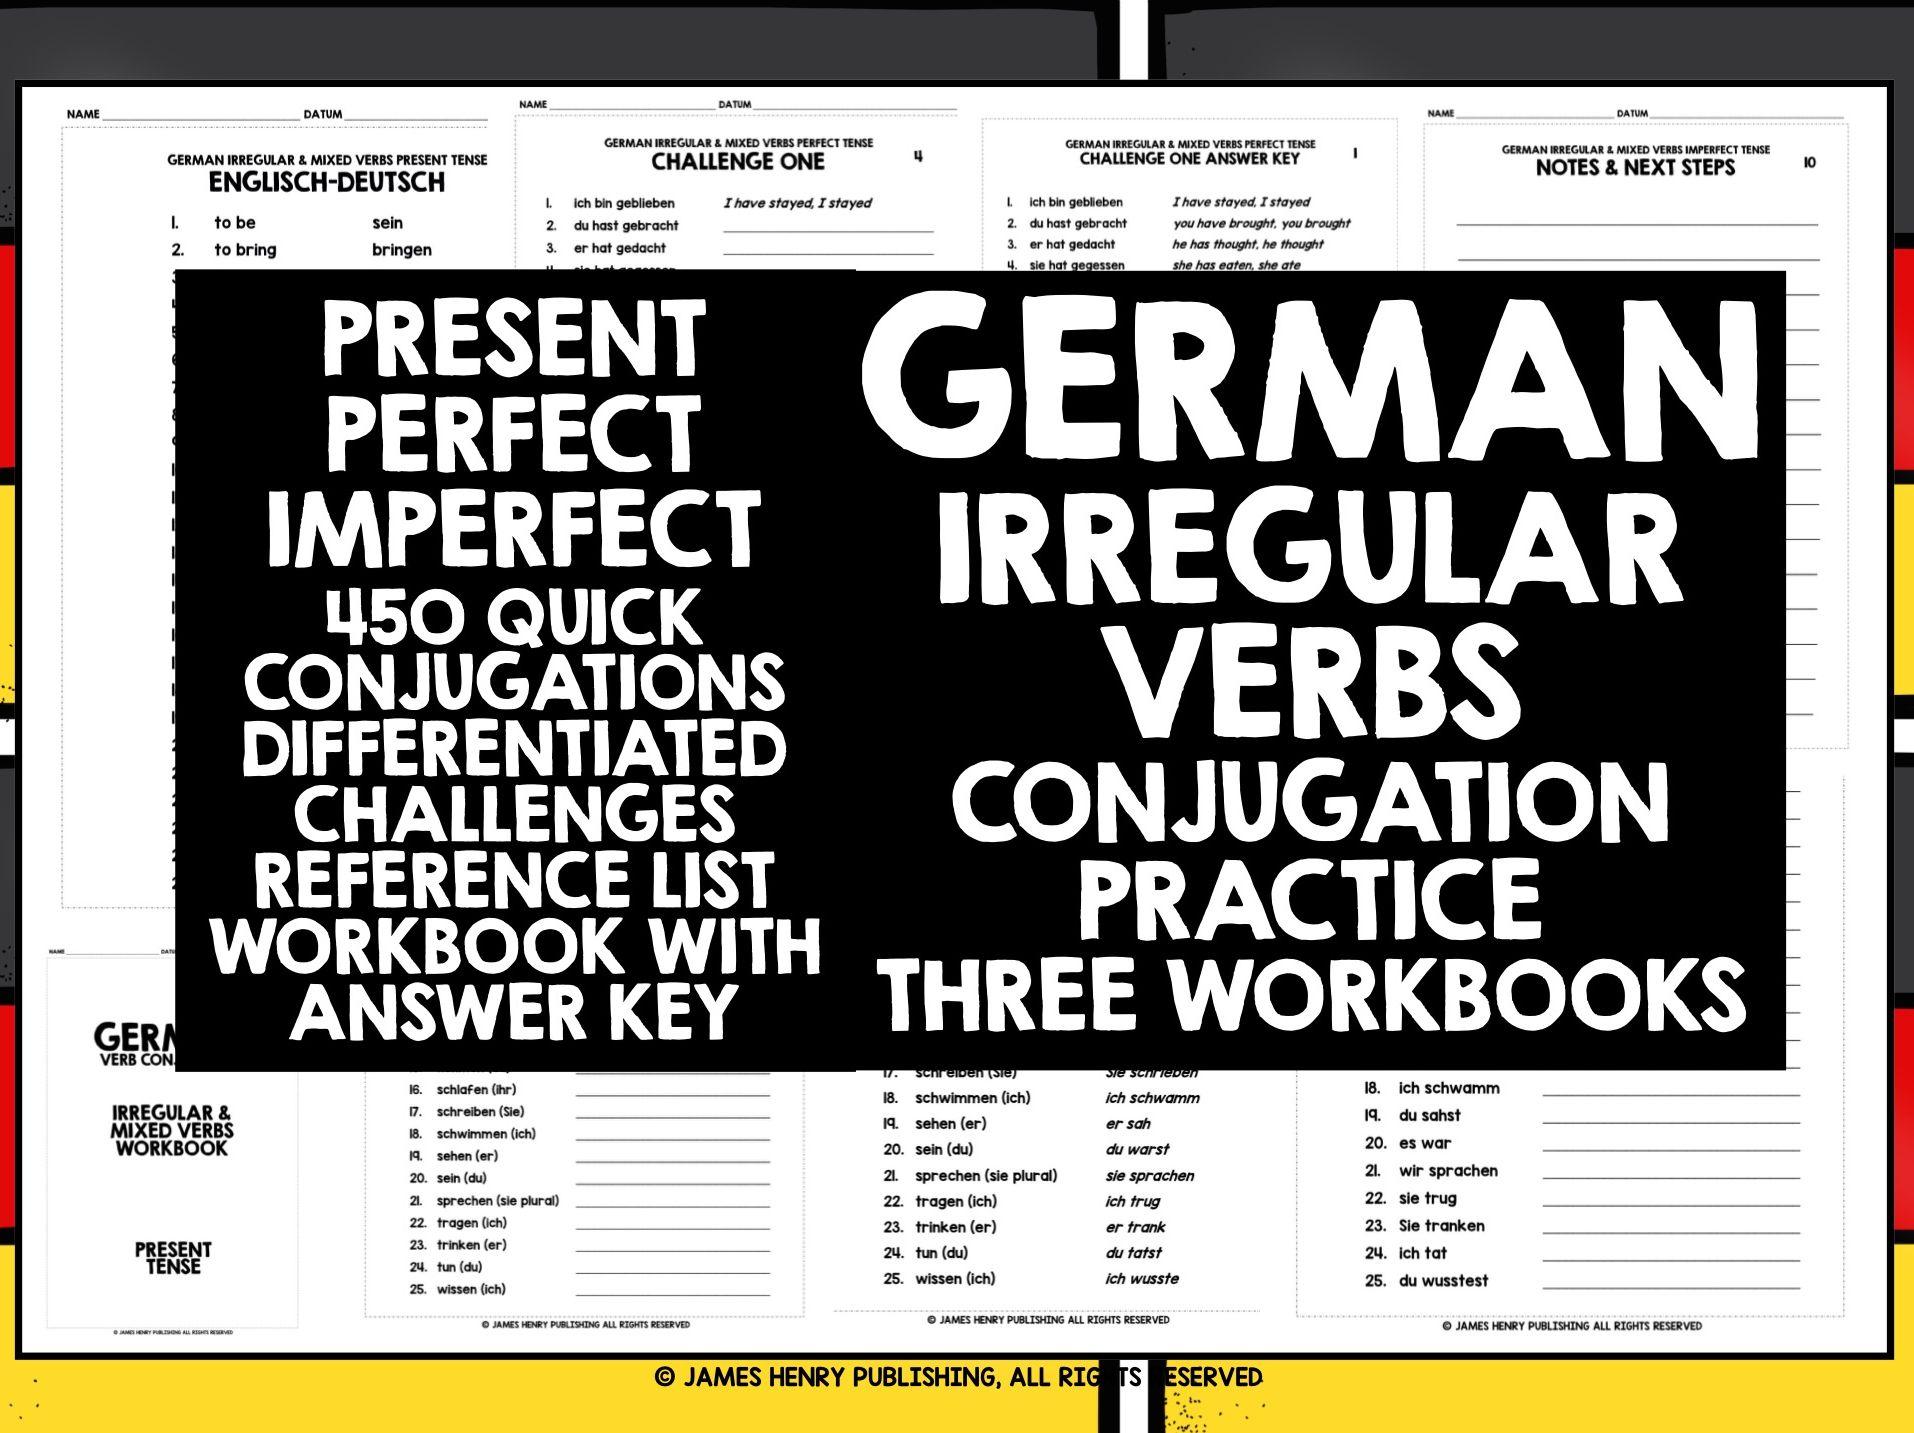 GERMAN IRREGULAR VERBS CONJUGATION THREE TENSES